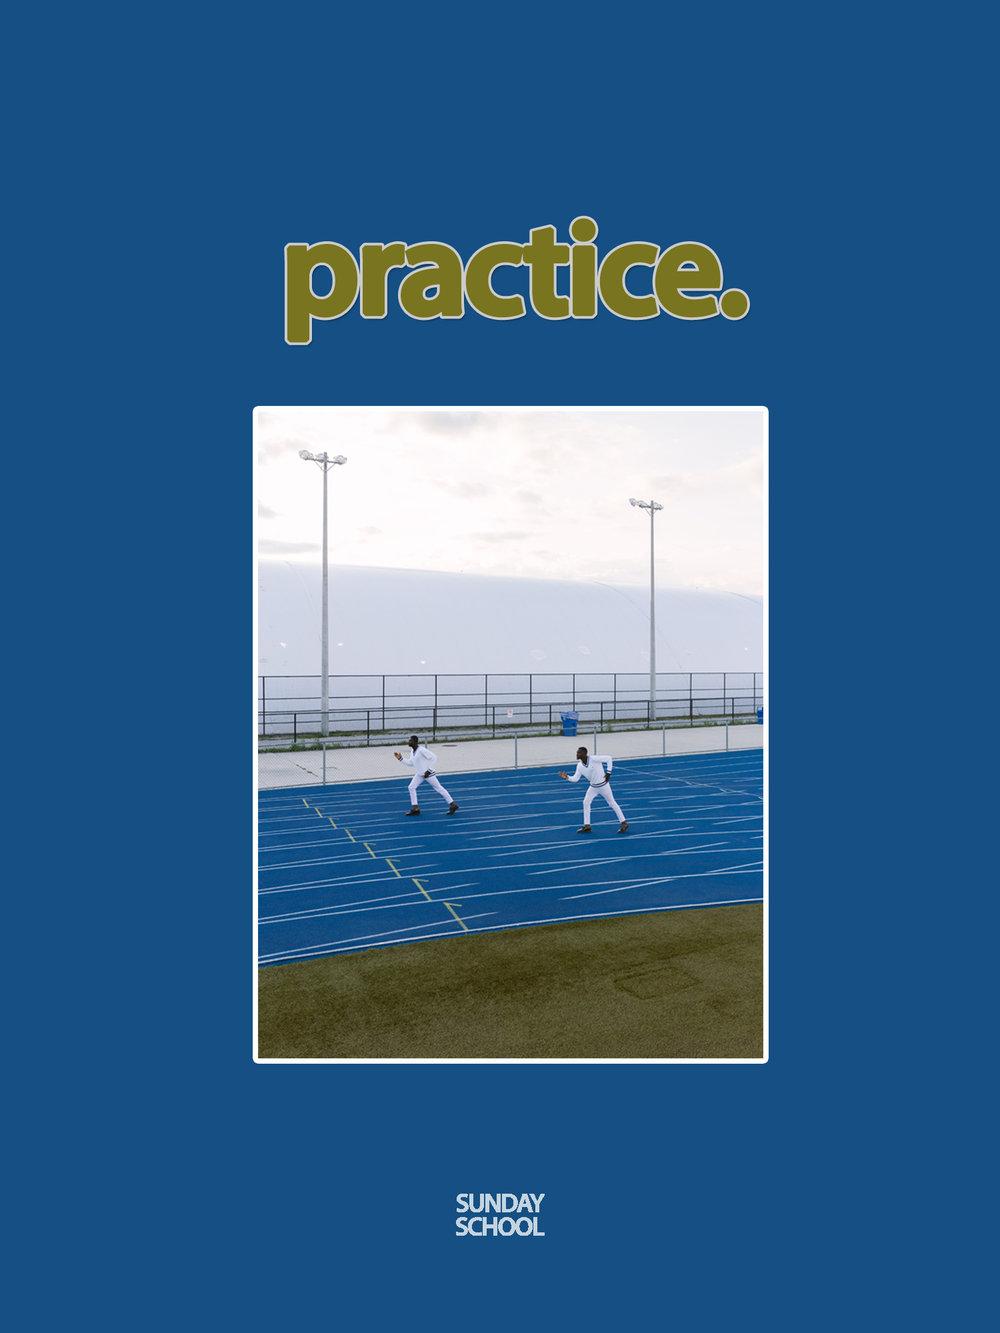 practiceofficial.jpg